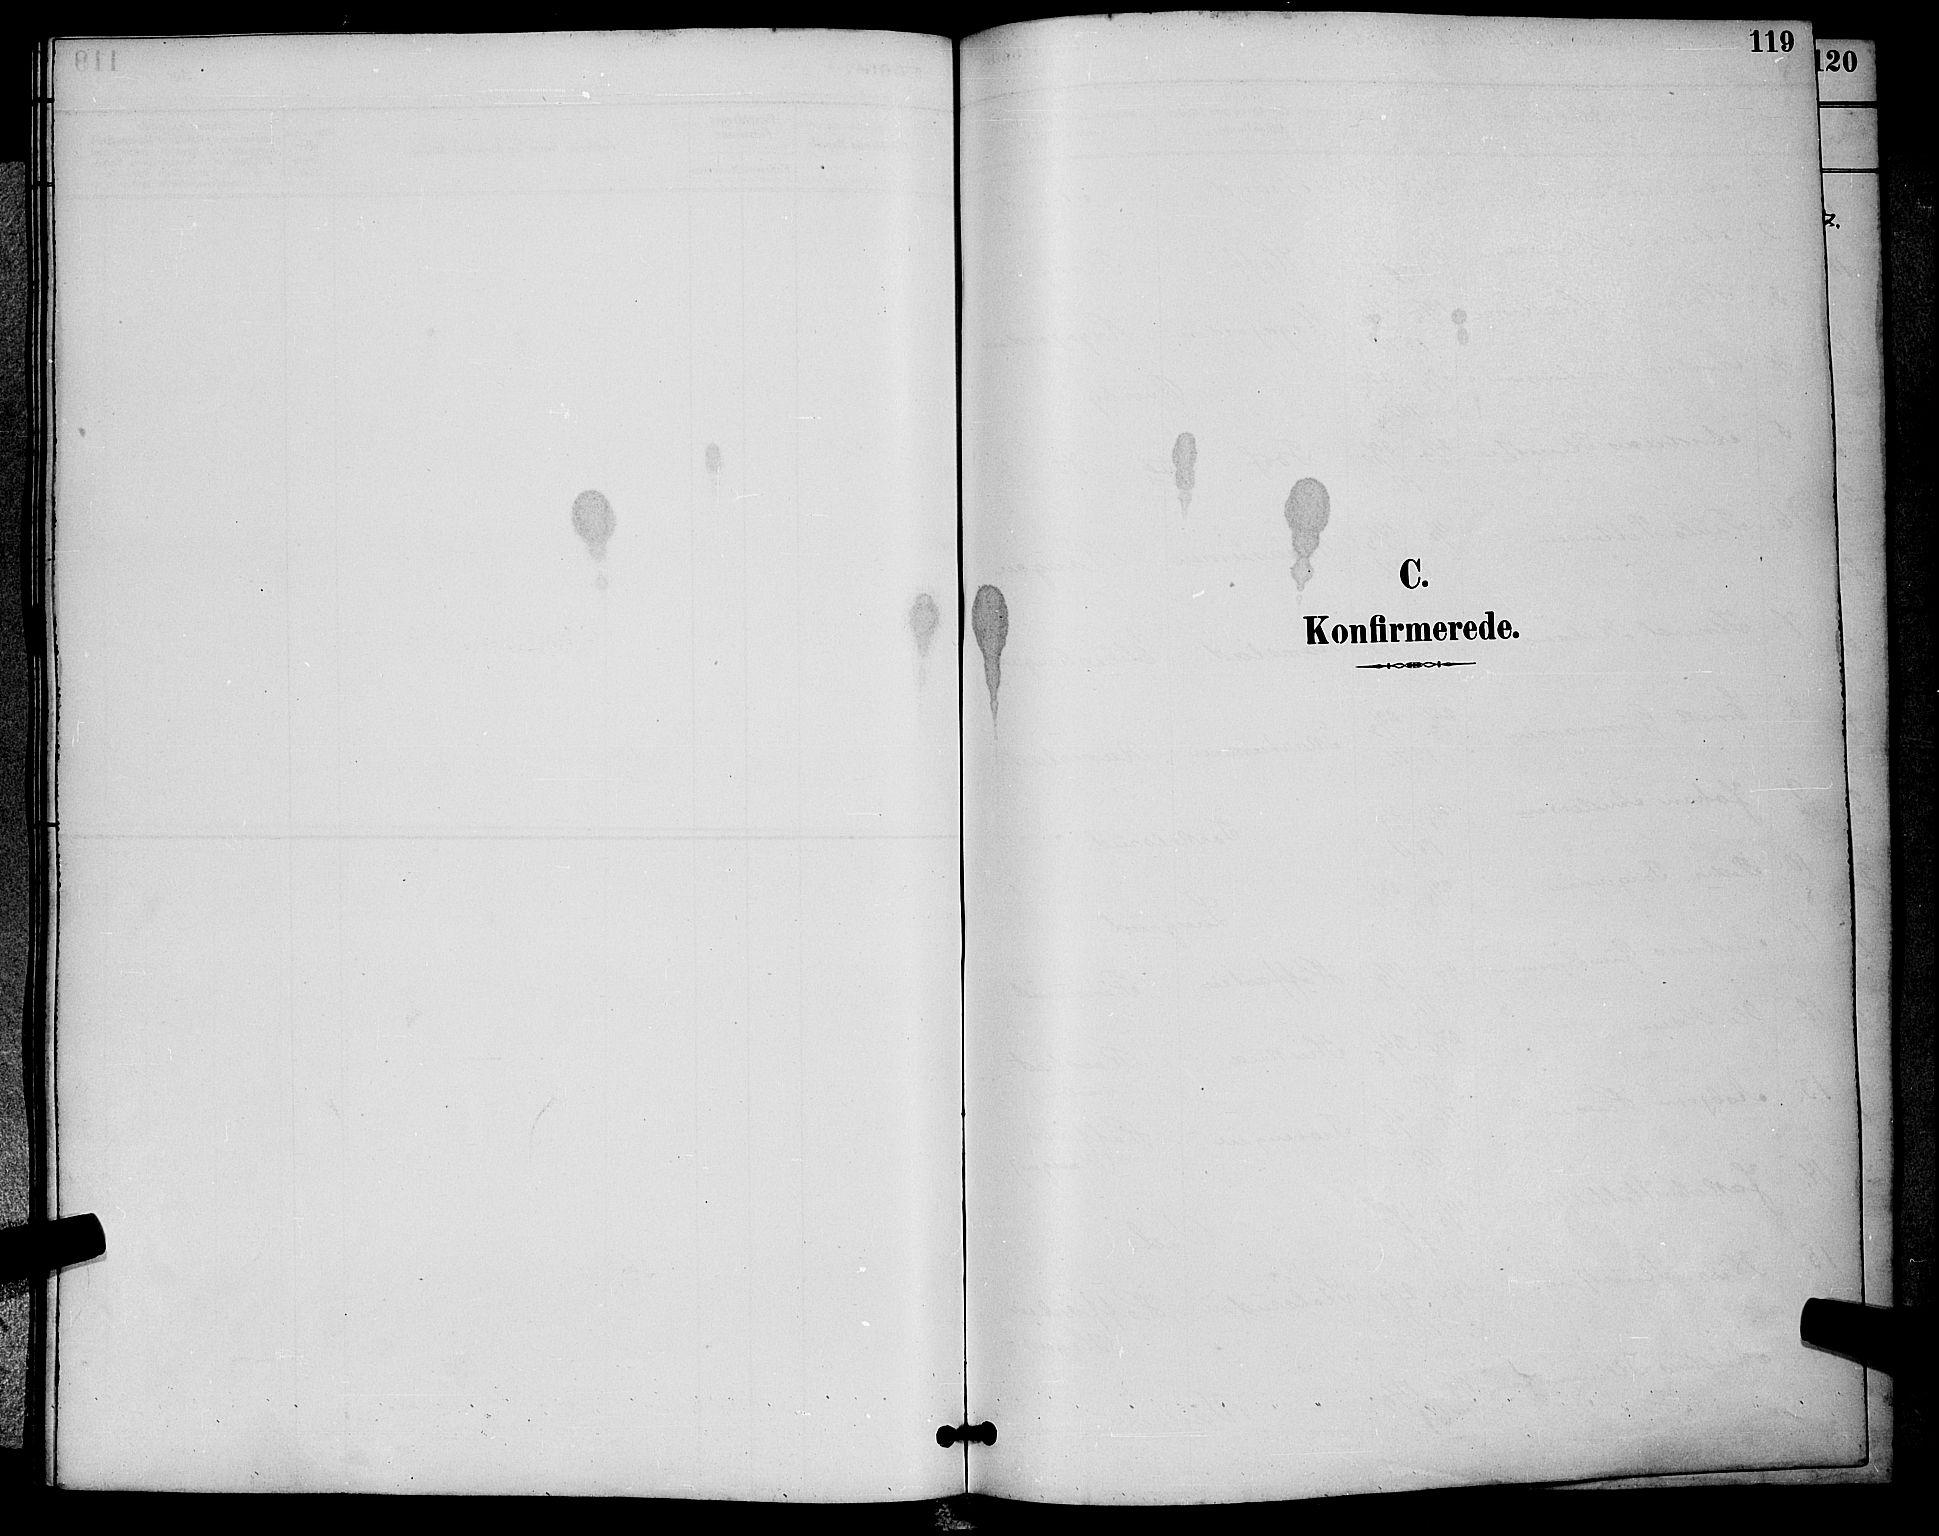 SAKO, Sigdal kirkebøker, G/Ga/L0005: Klokkerbok nr. I 5, 1886-1900, s. 119